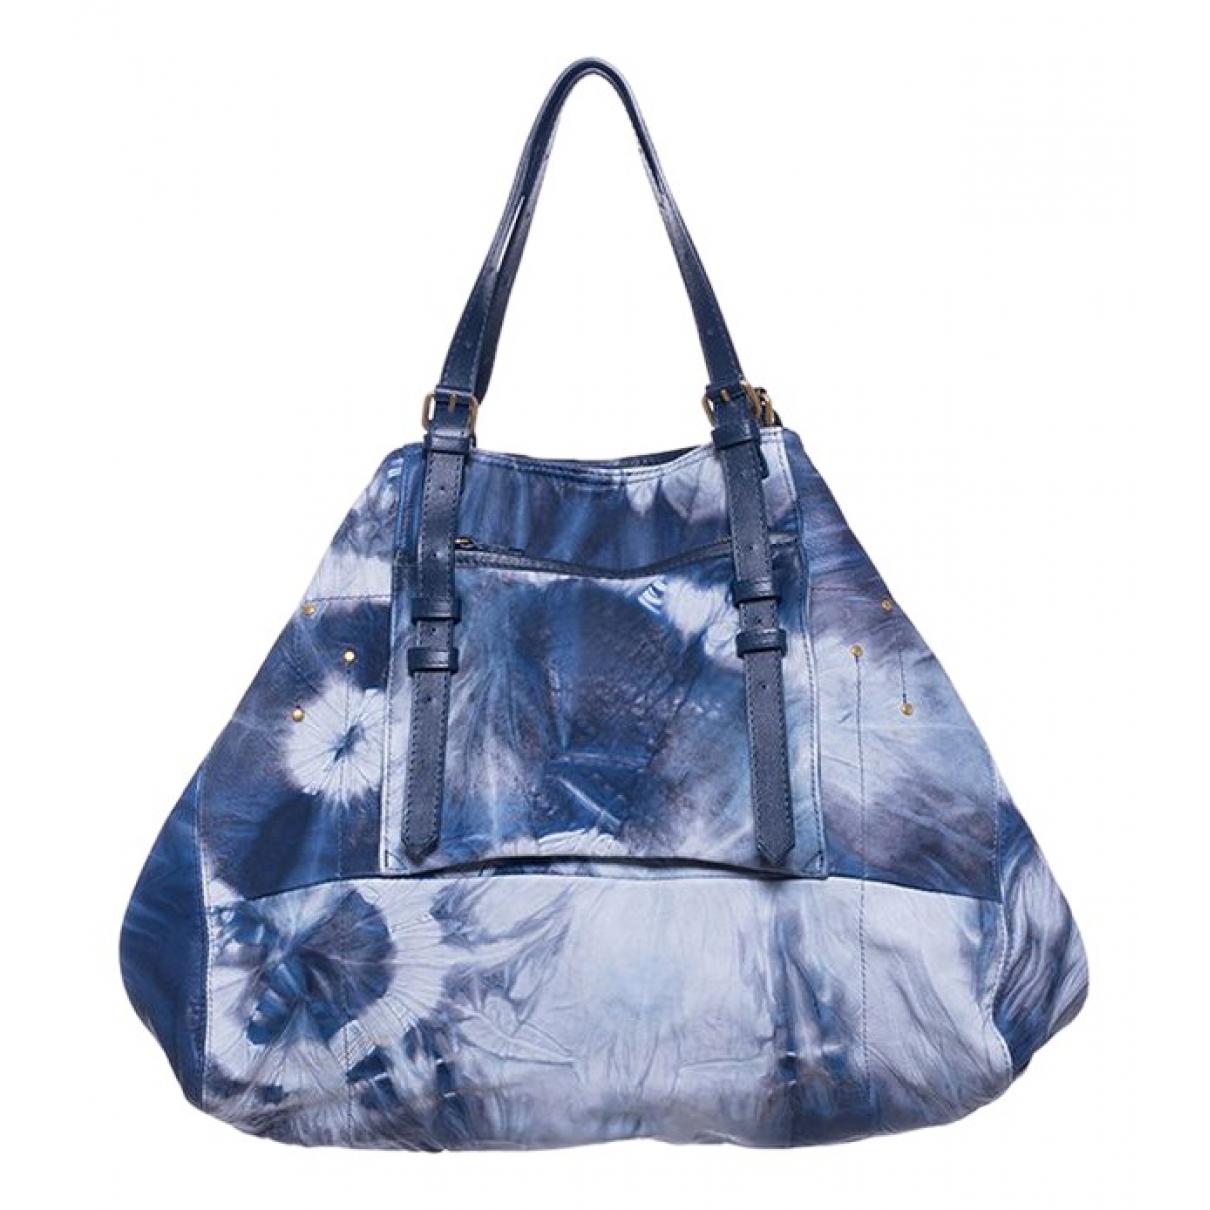 Jerome Dreyfuss Pat Handtasche in  Blau Leder